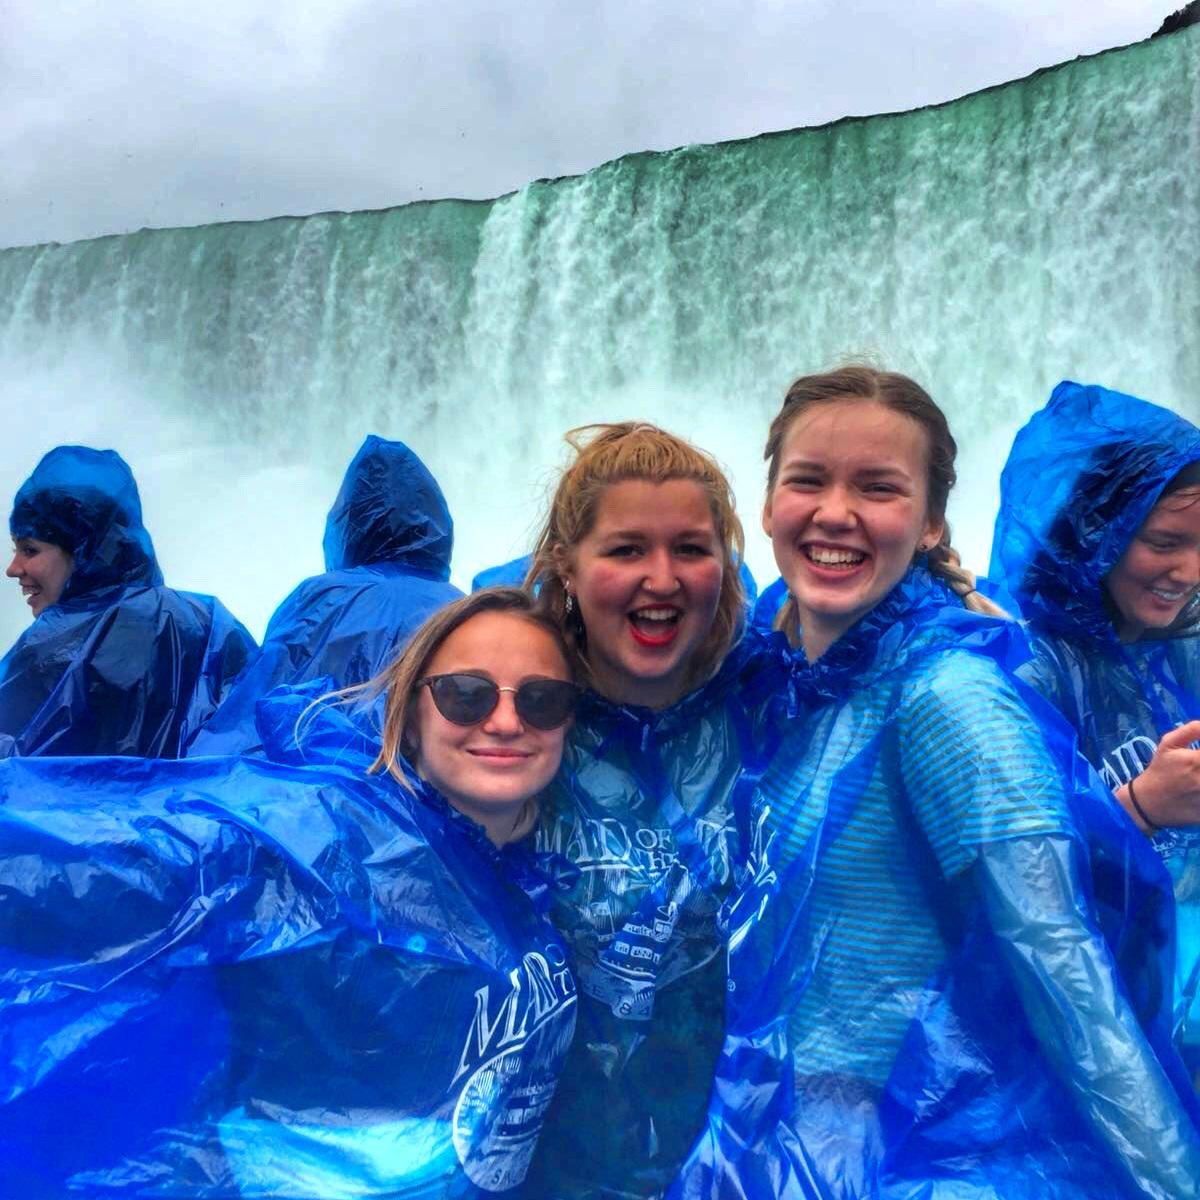 Niagara+Falls+Maria+maid+of+the+mist.jpg